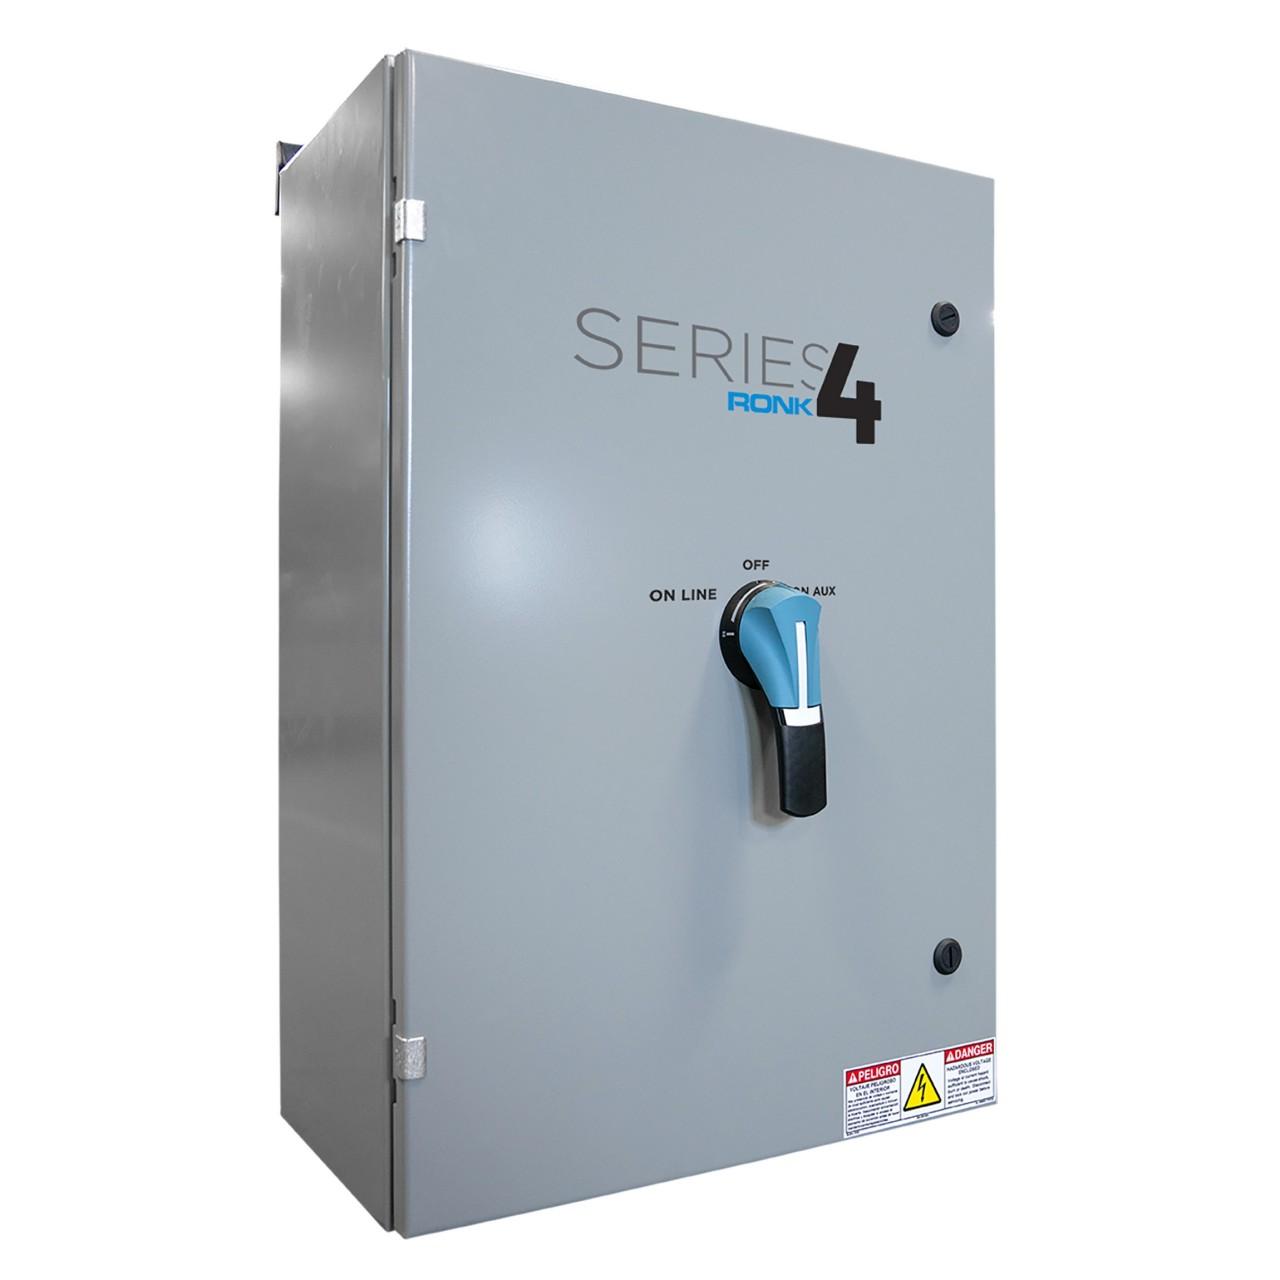 Ronk 4404 Transfer Switch (3Ph, 4-Pole, 400A)